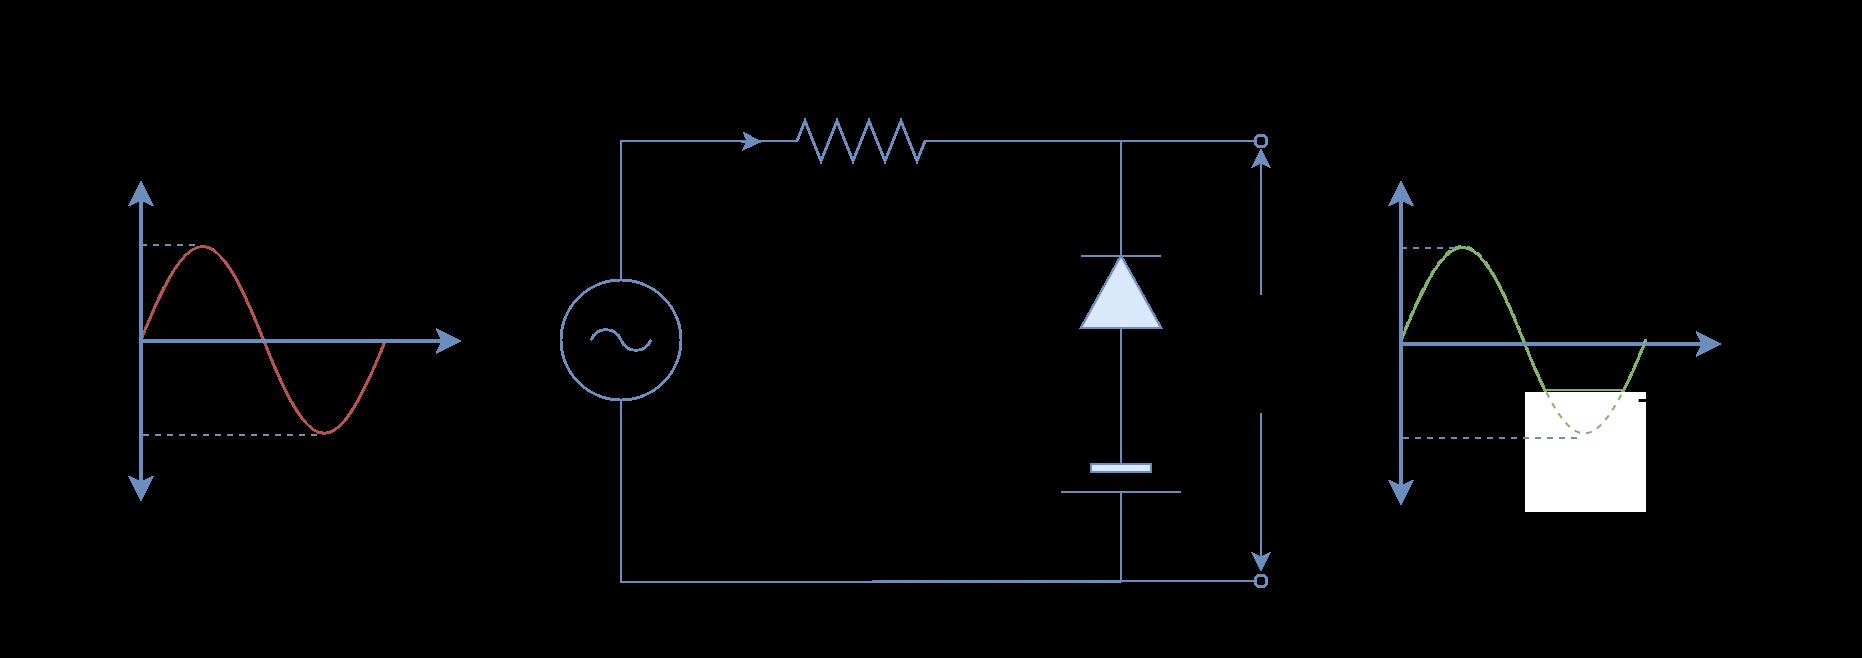 Negative cycle bias diode clipper